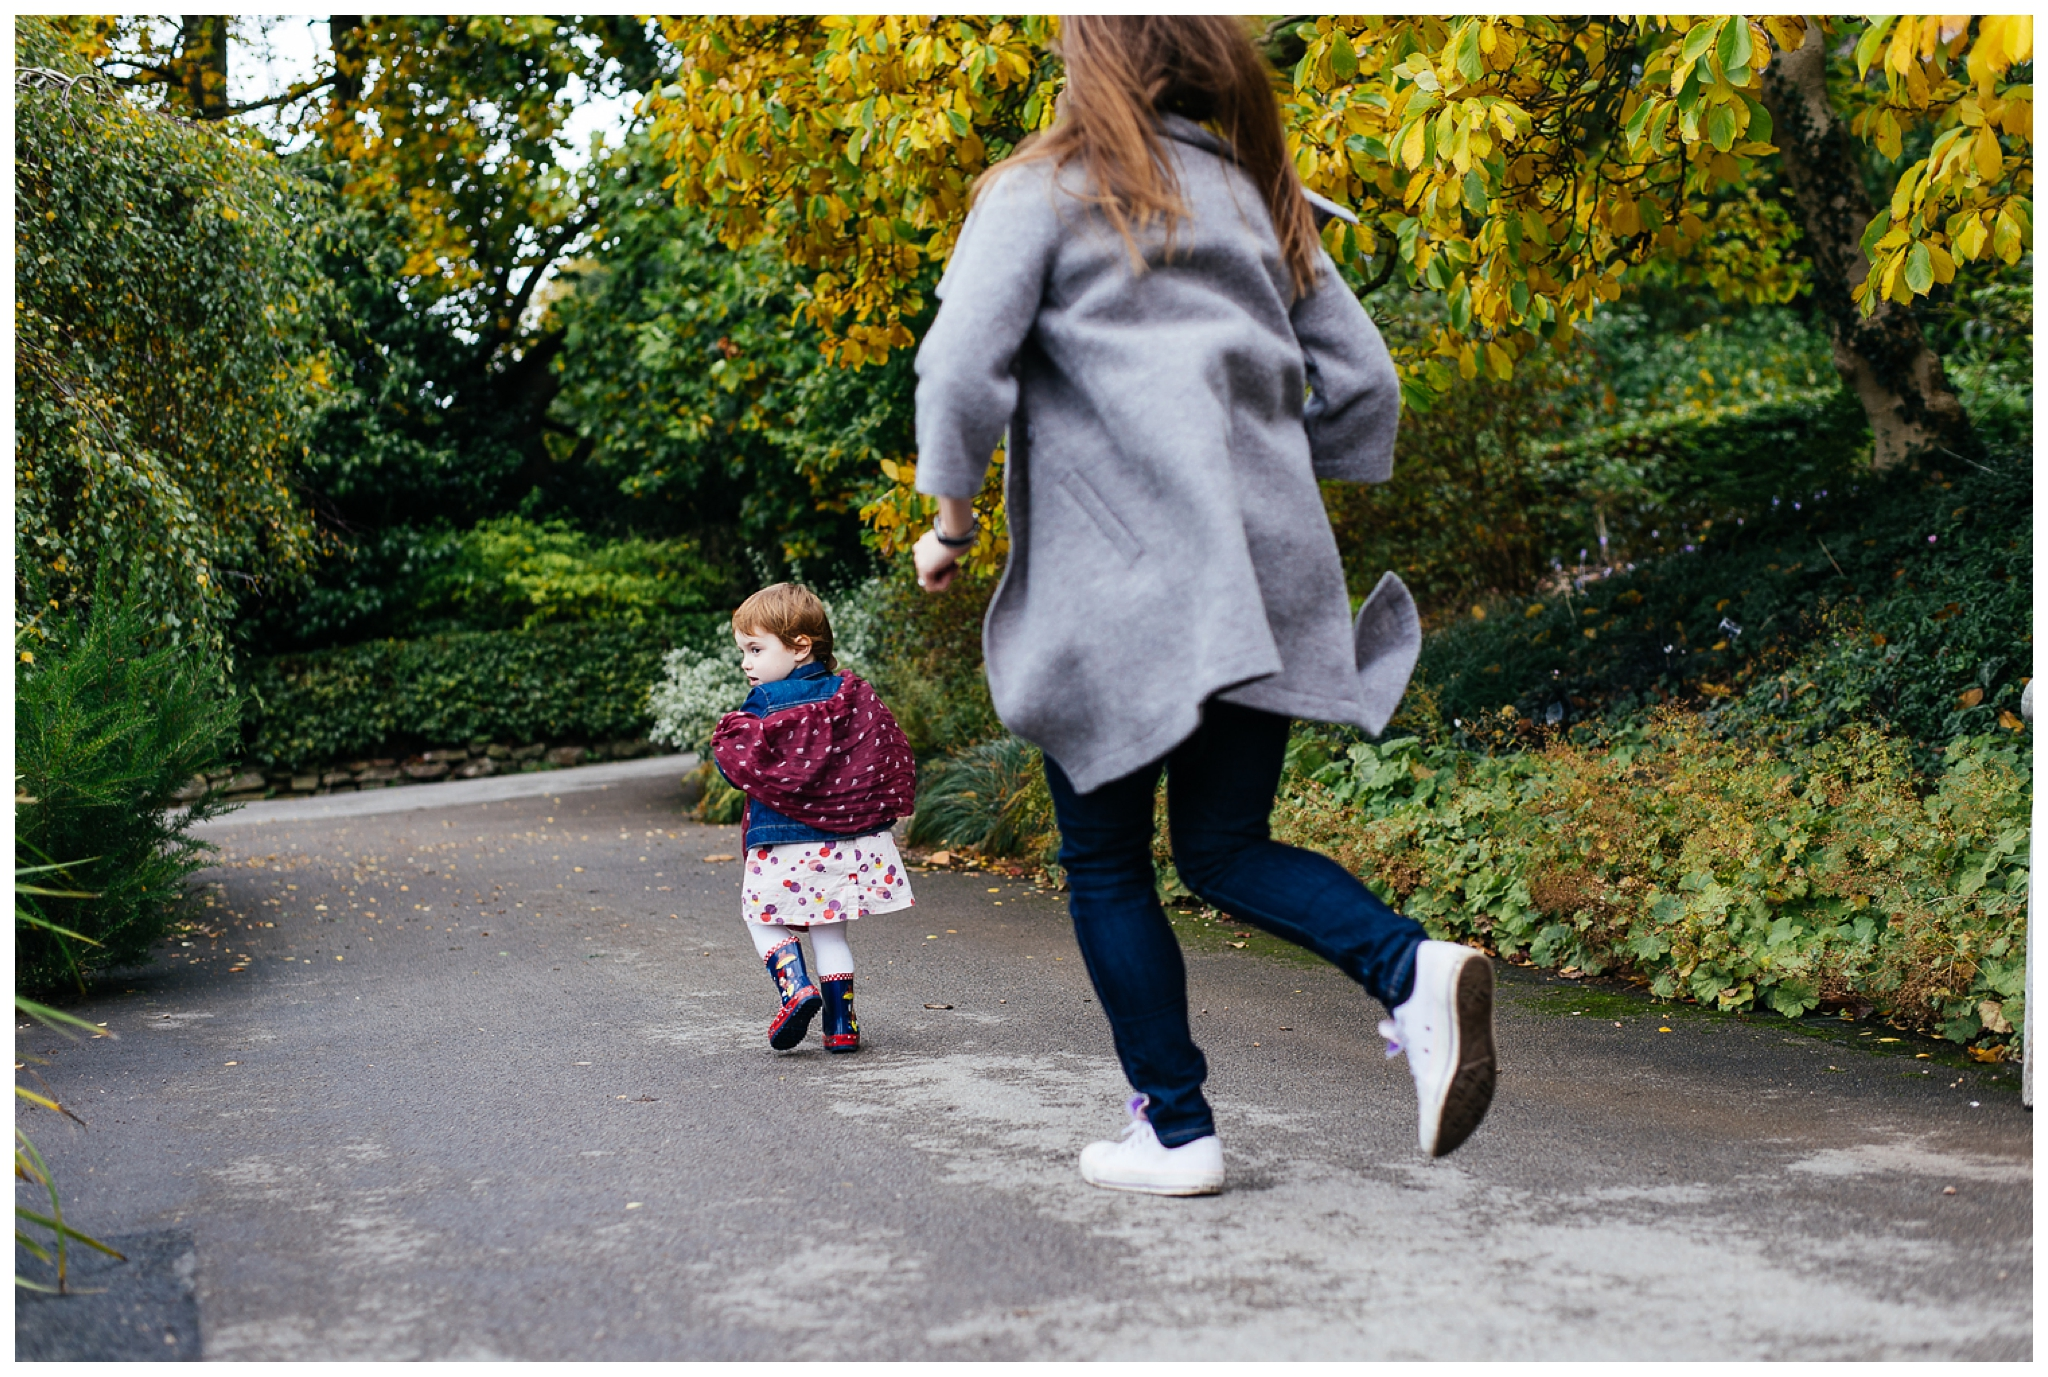 Autumn-family-portraits-birmingham-photographer_0038.jpg